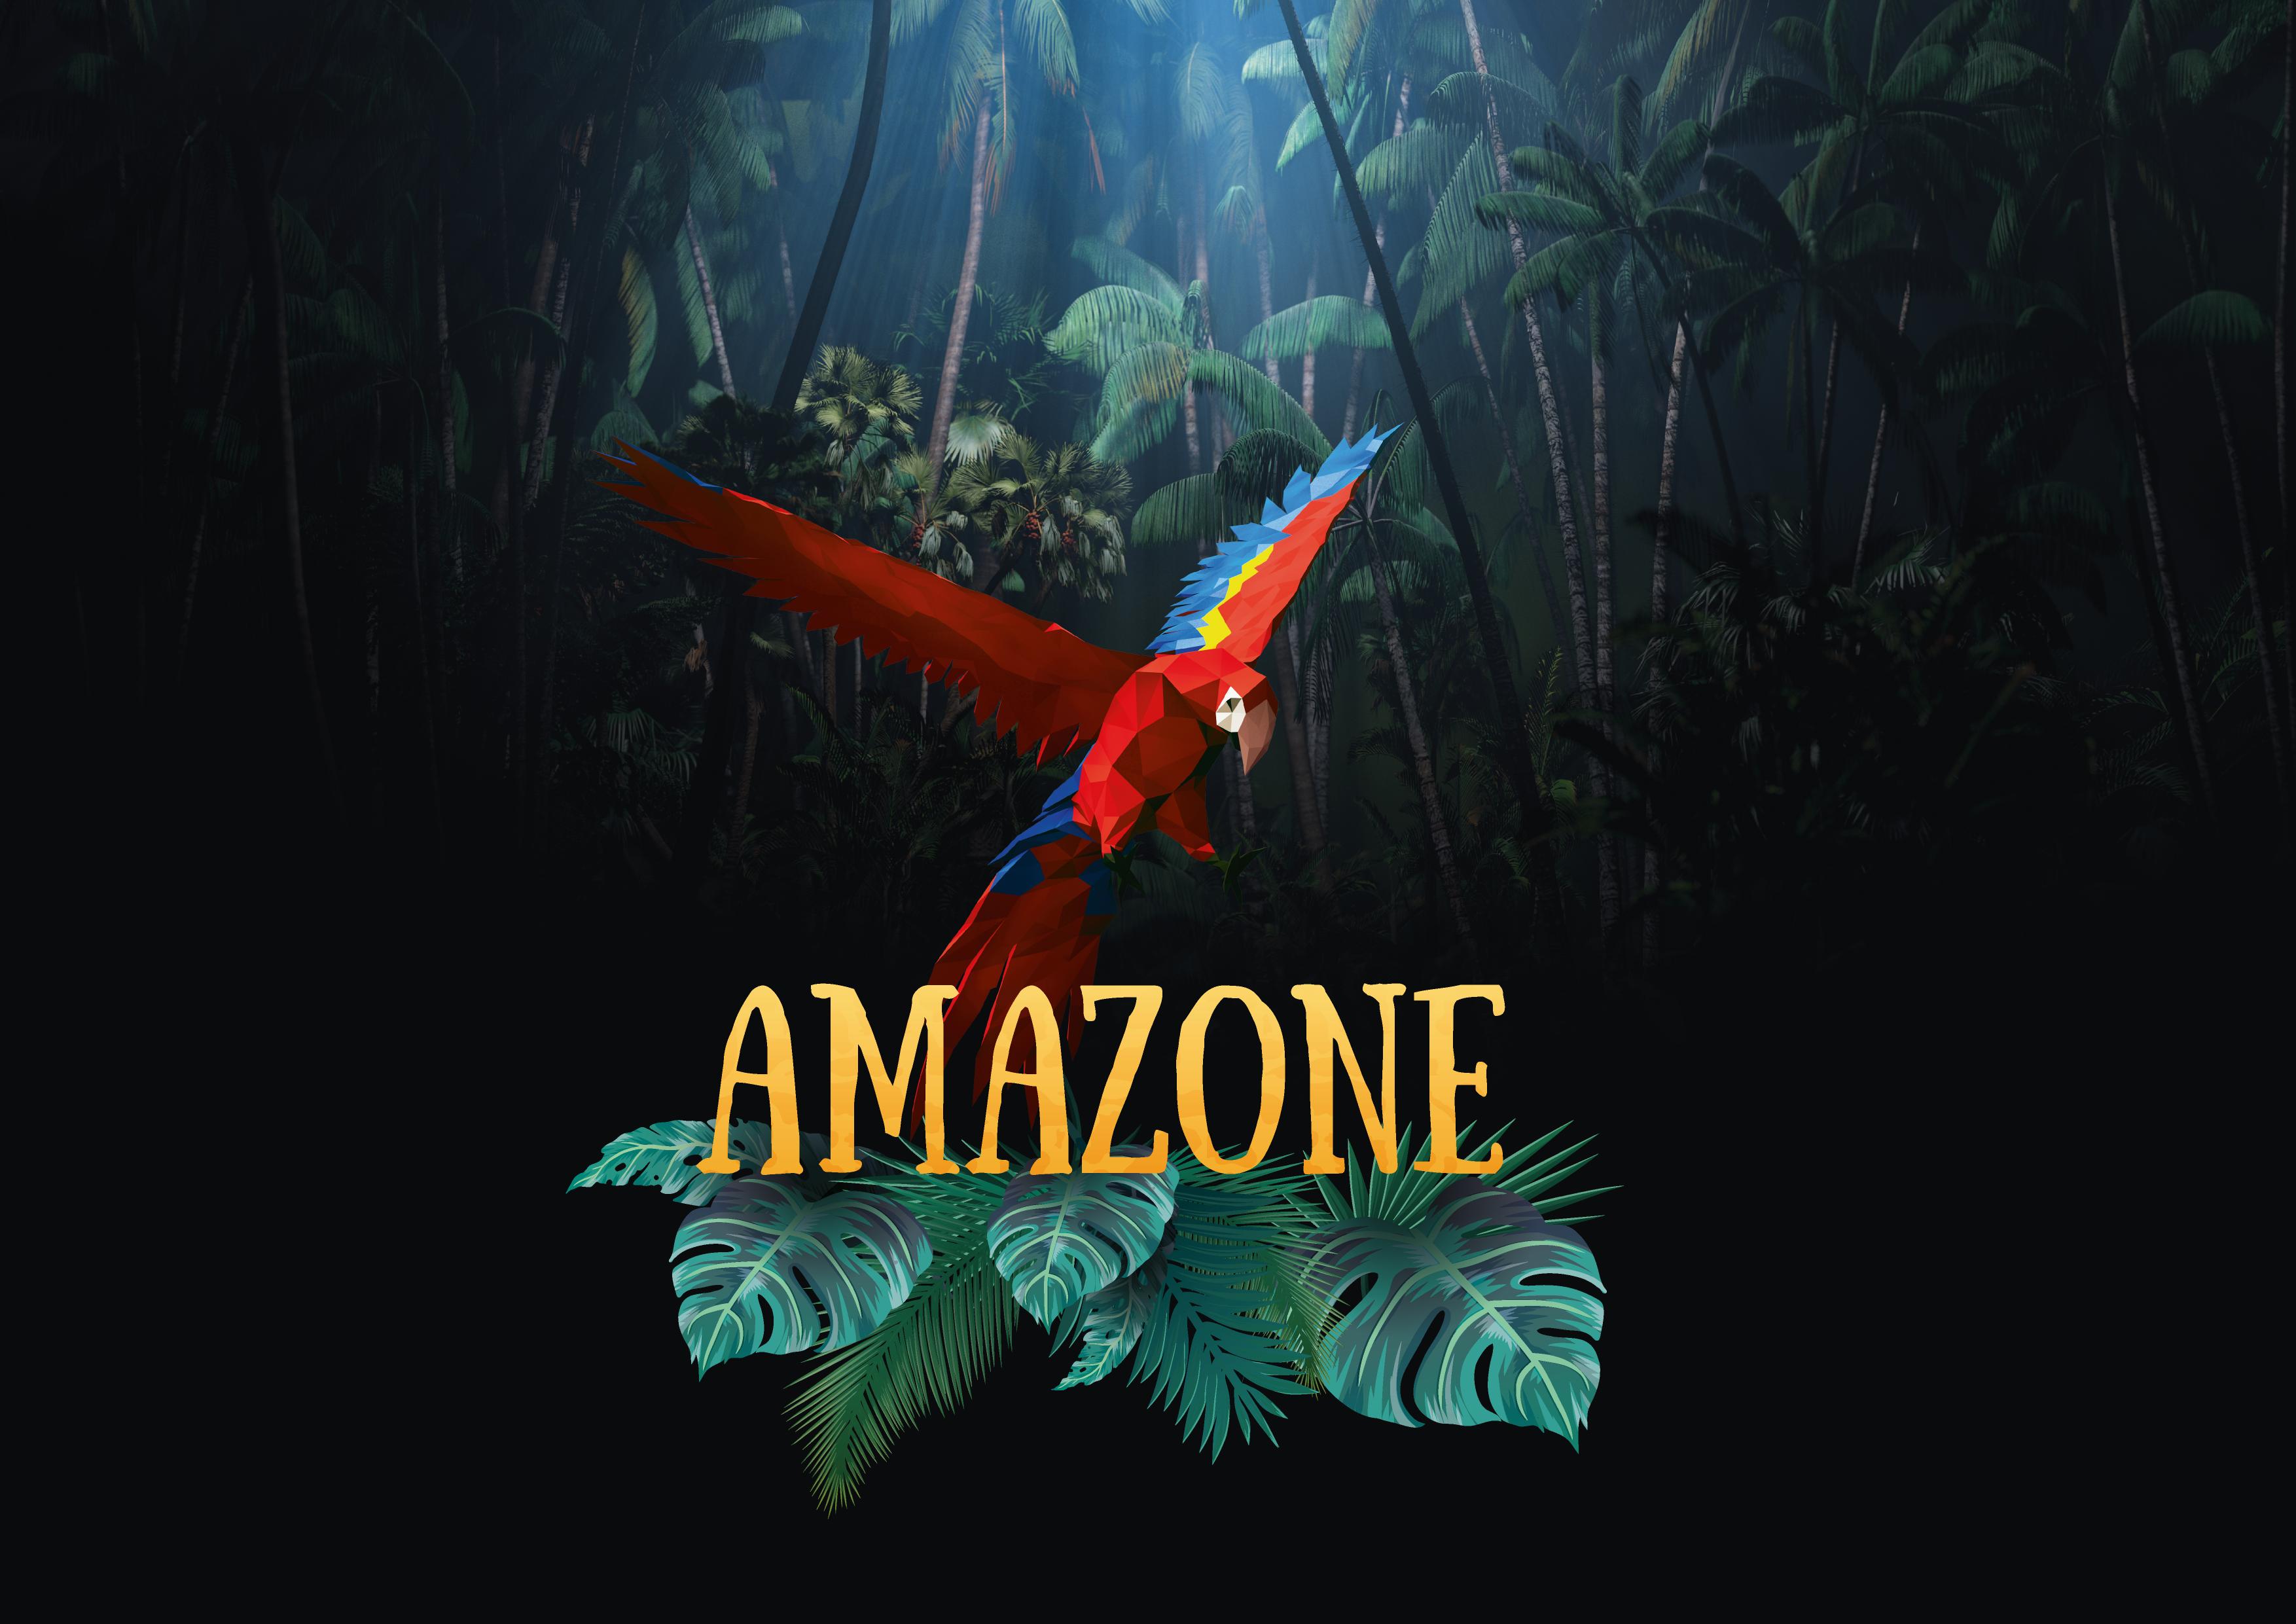 AMAZONE-E.TASTY